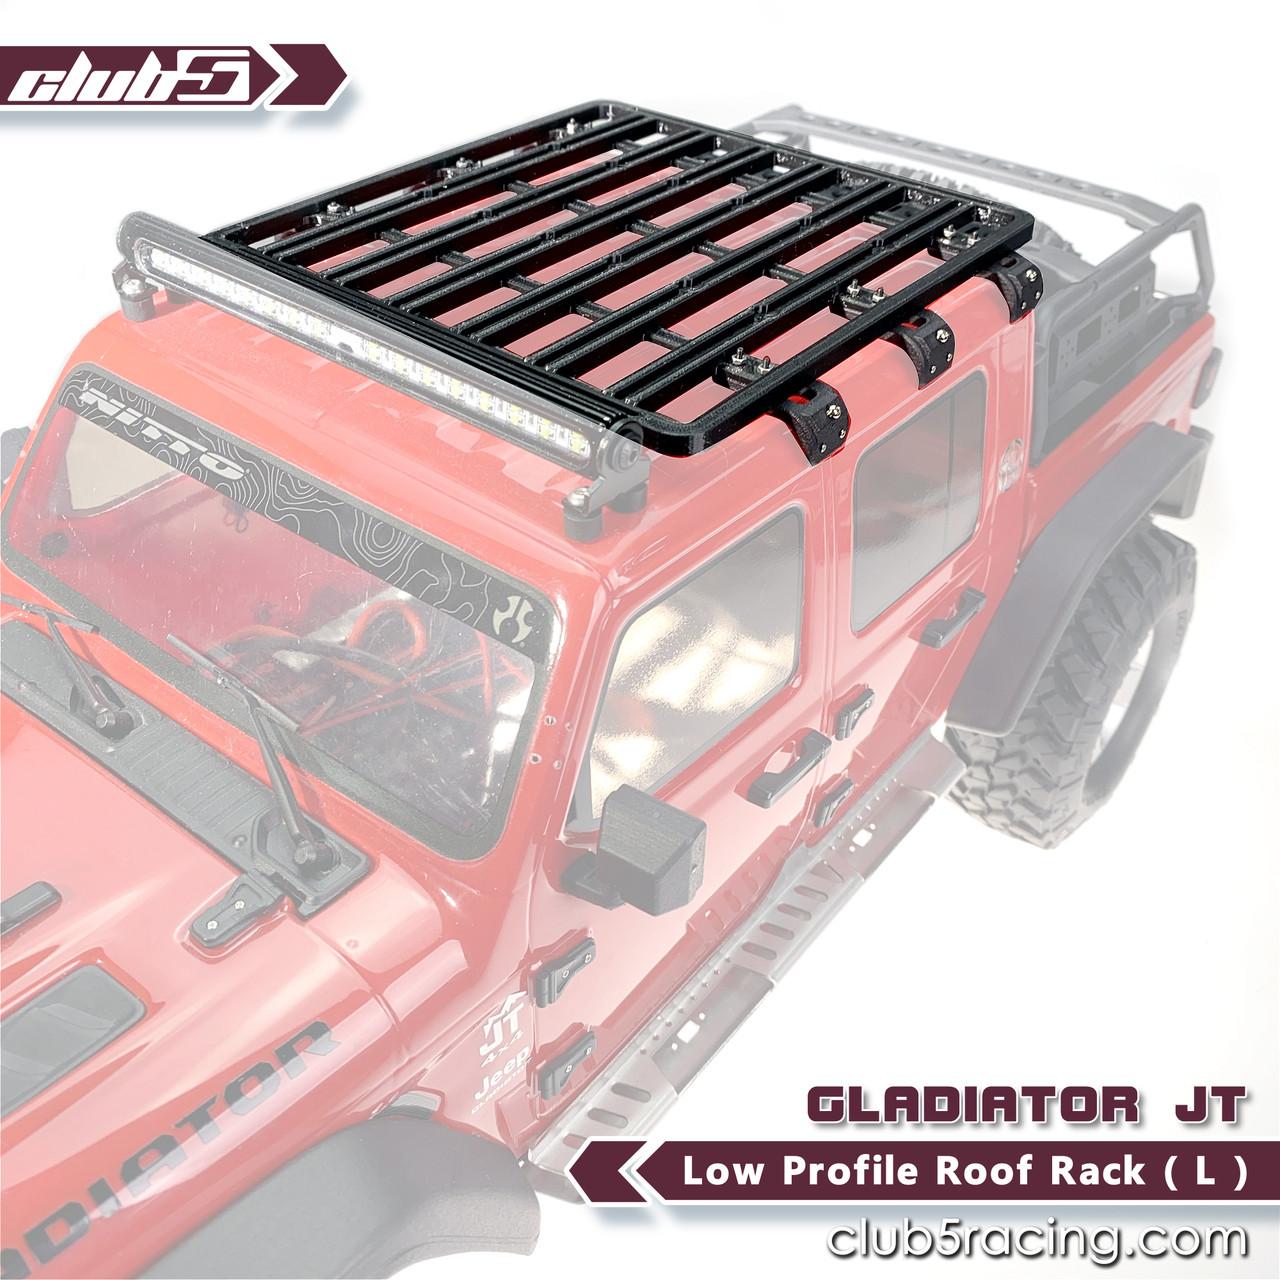 low profile roof rack l for scx10 iii jeep jl wrangler jt gladiator 3dp